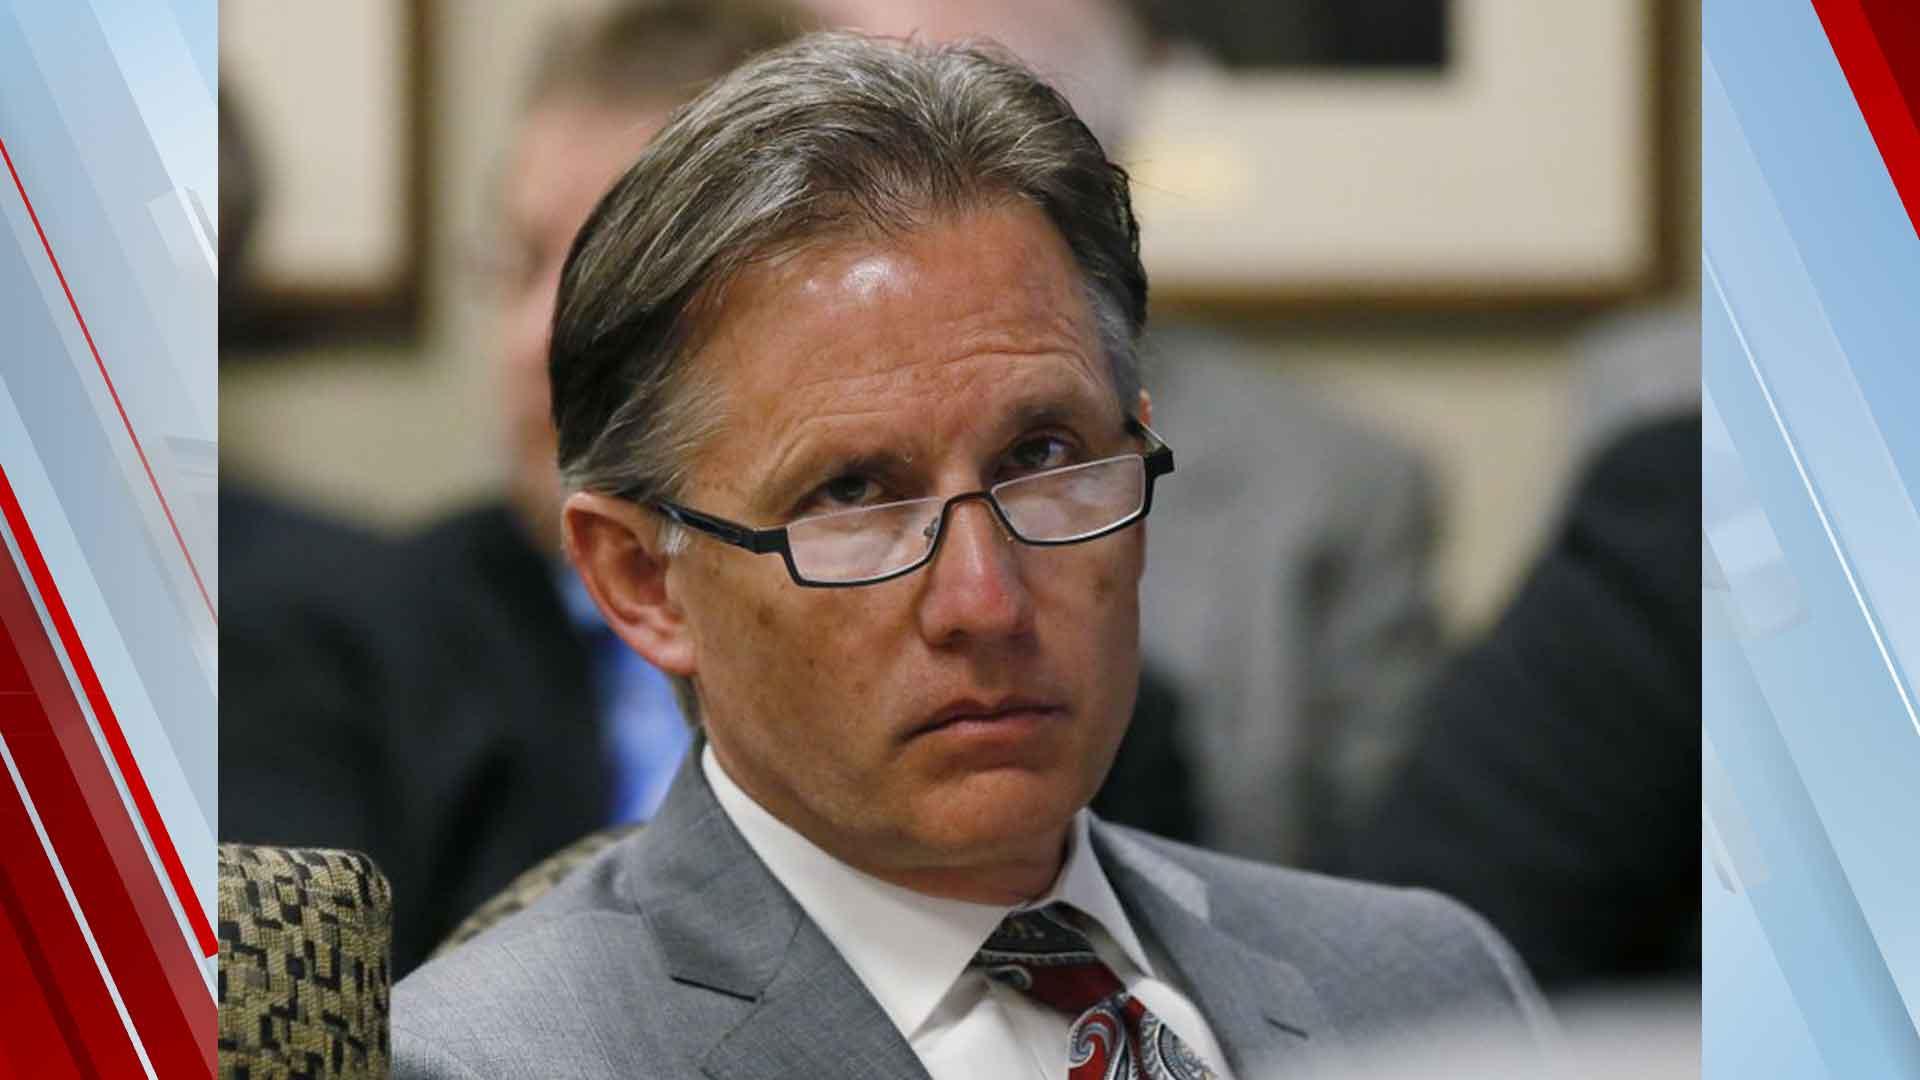 Oklahoma Seeking To Return $2M Worth Of Hydroxychloroquine